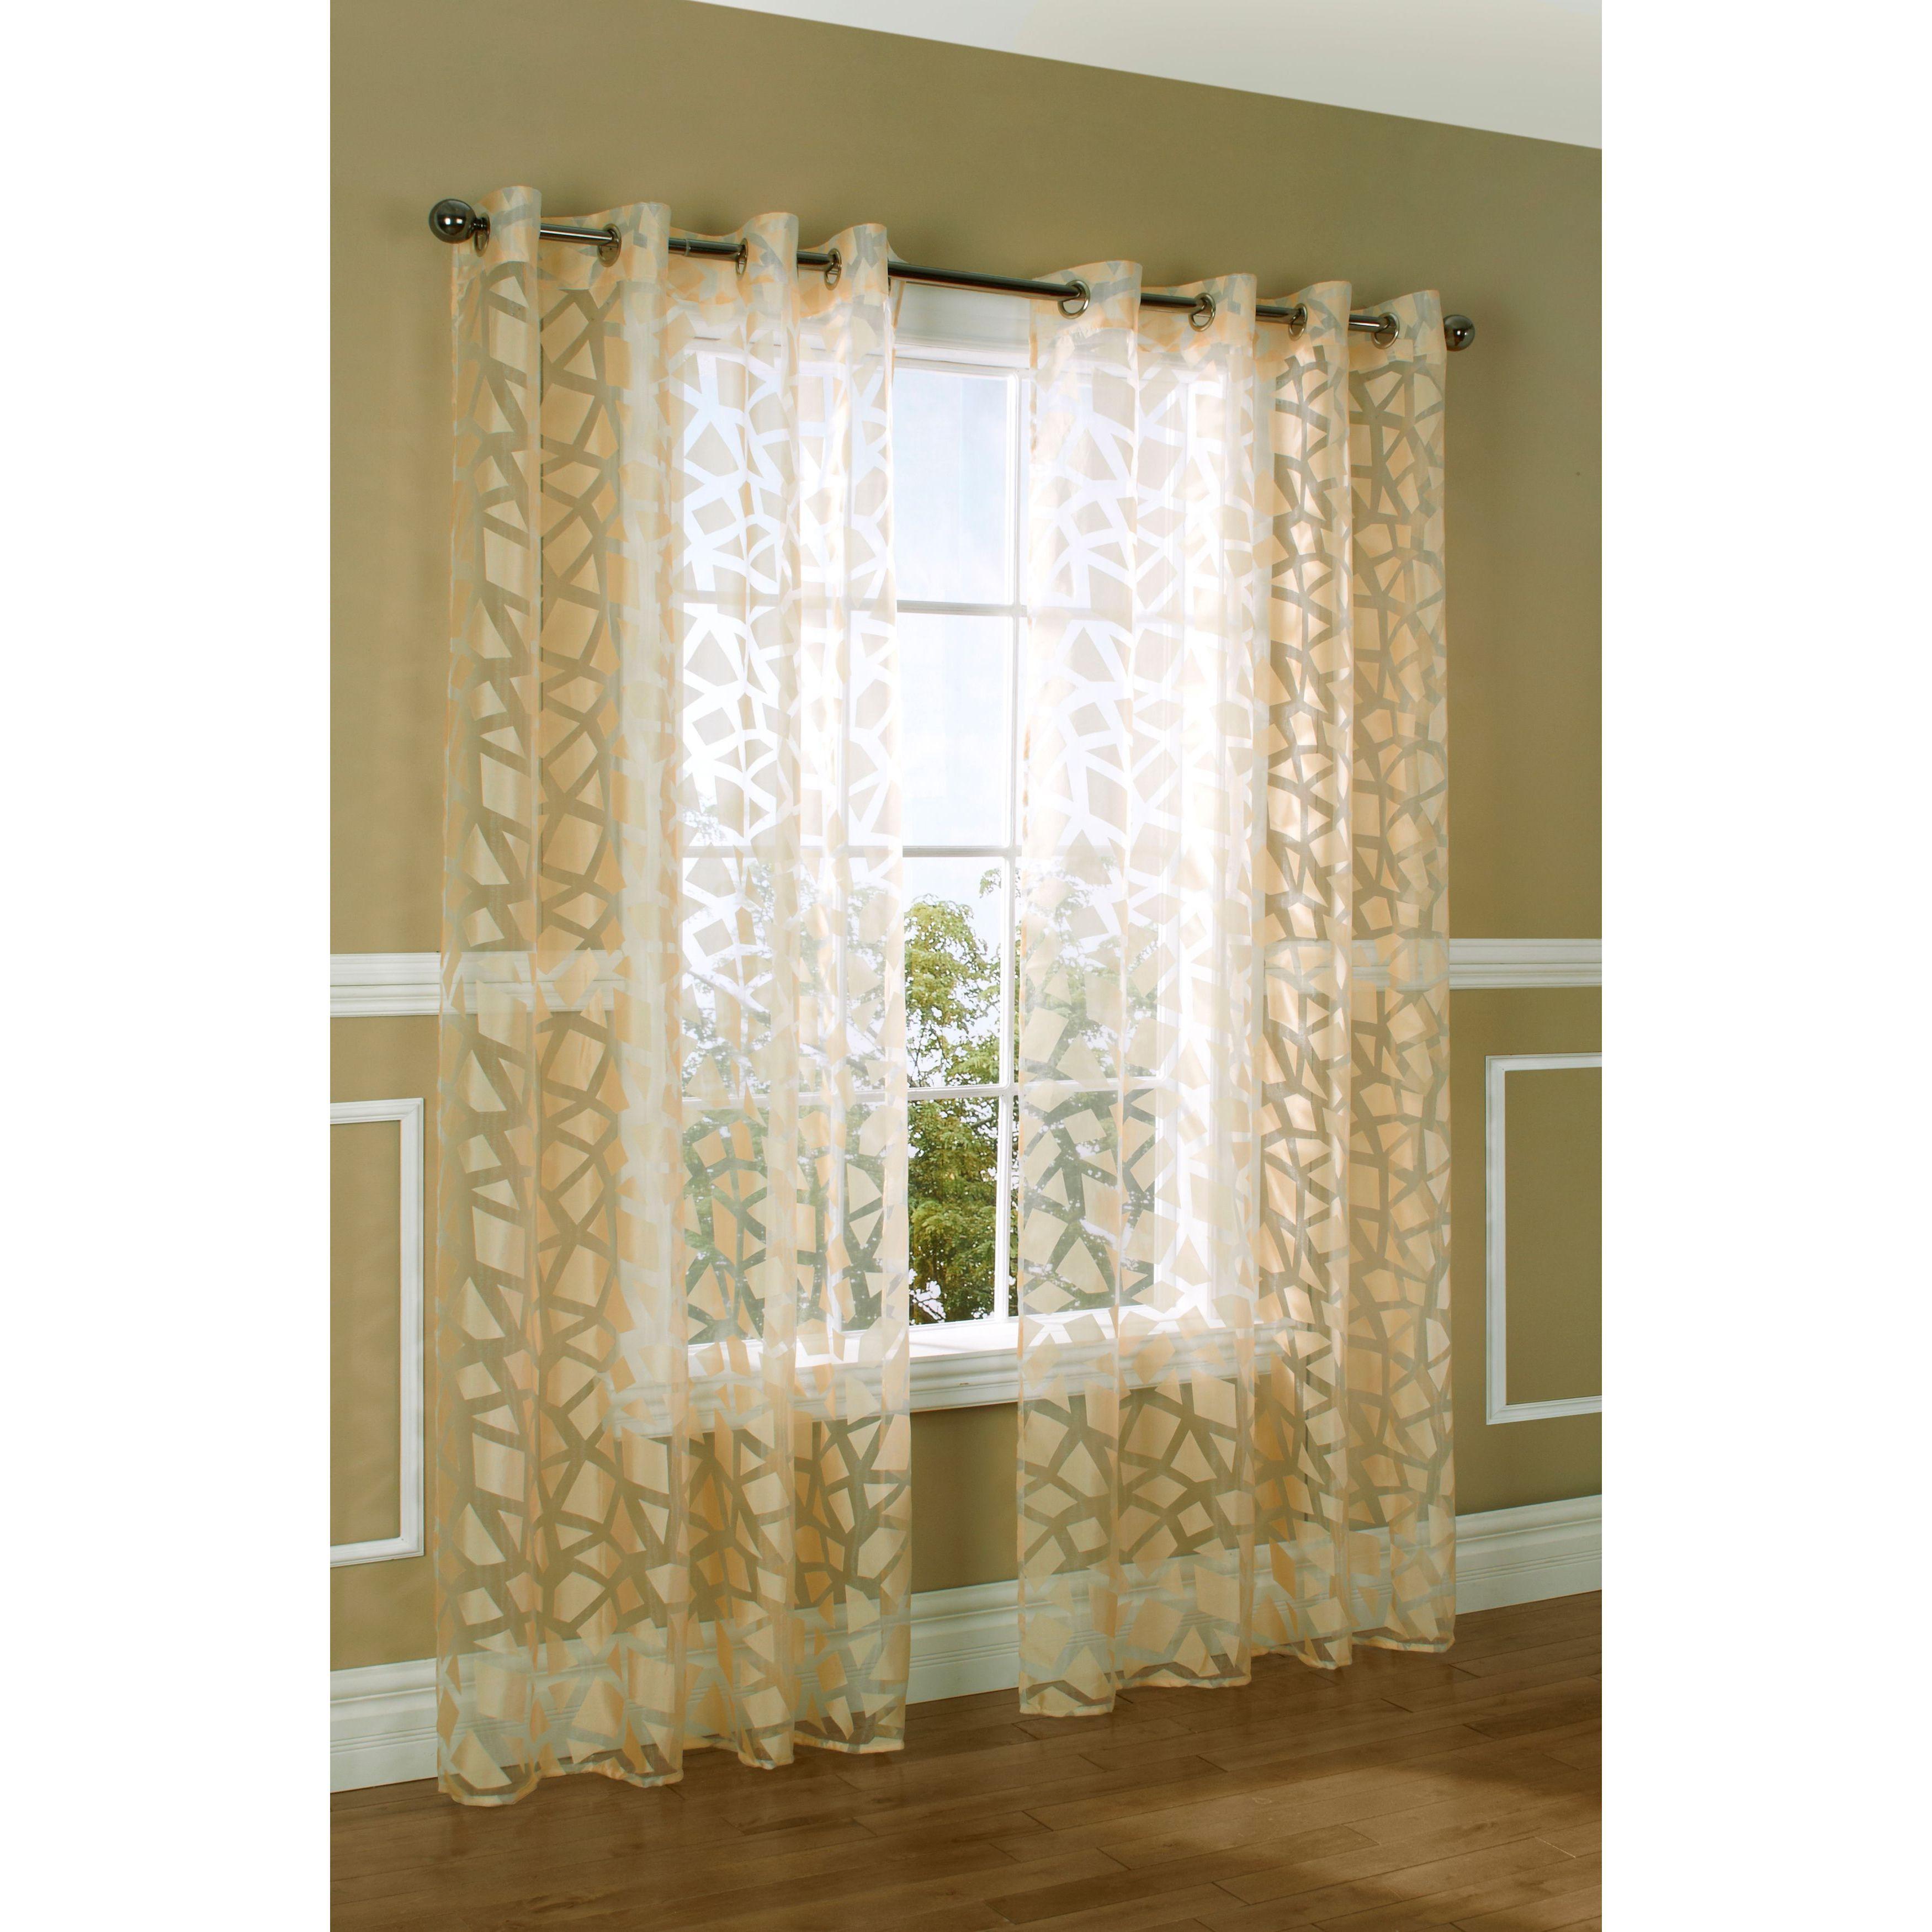 curtain storslagen set window black catalog pin rod walls and